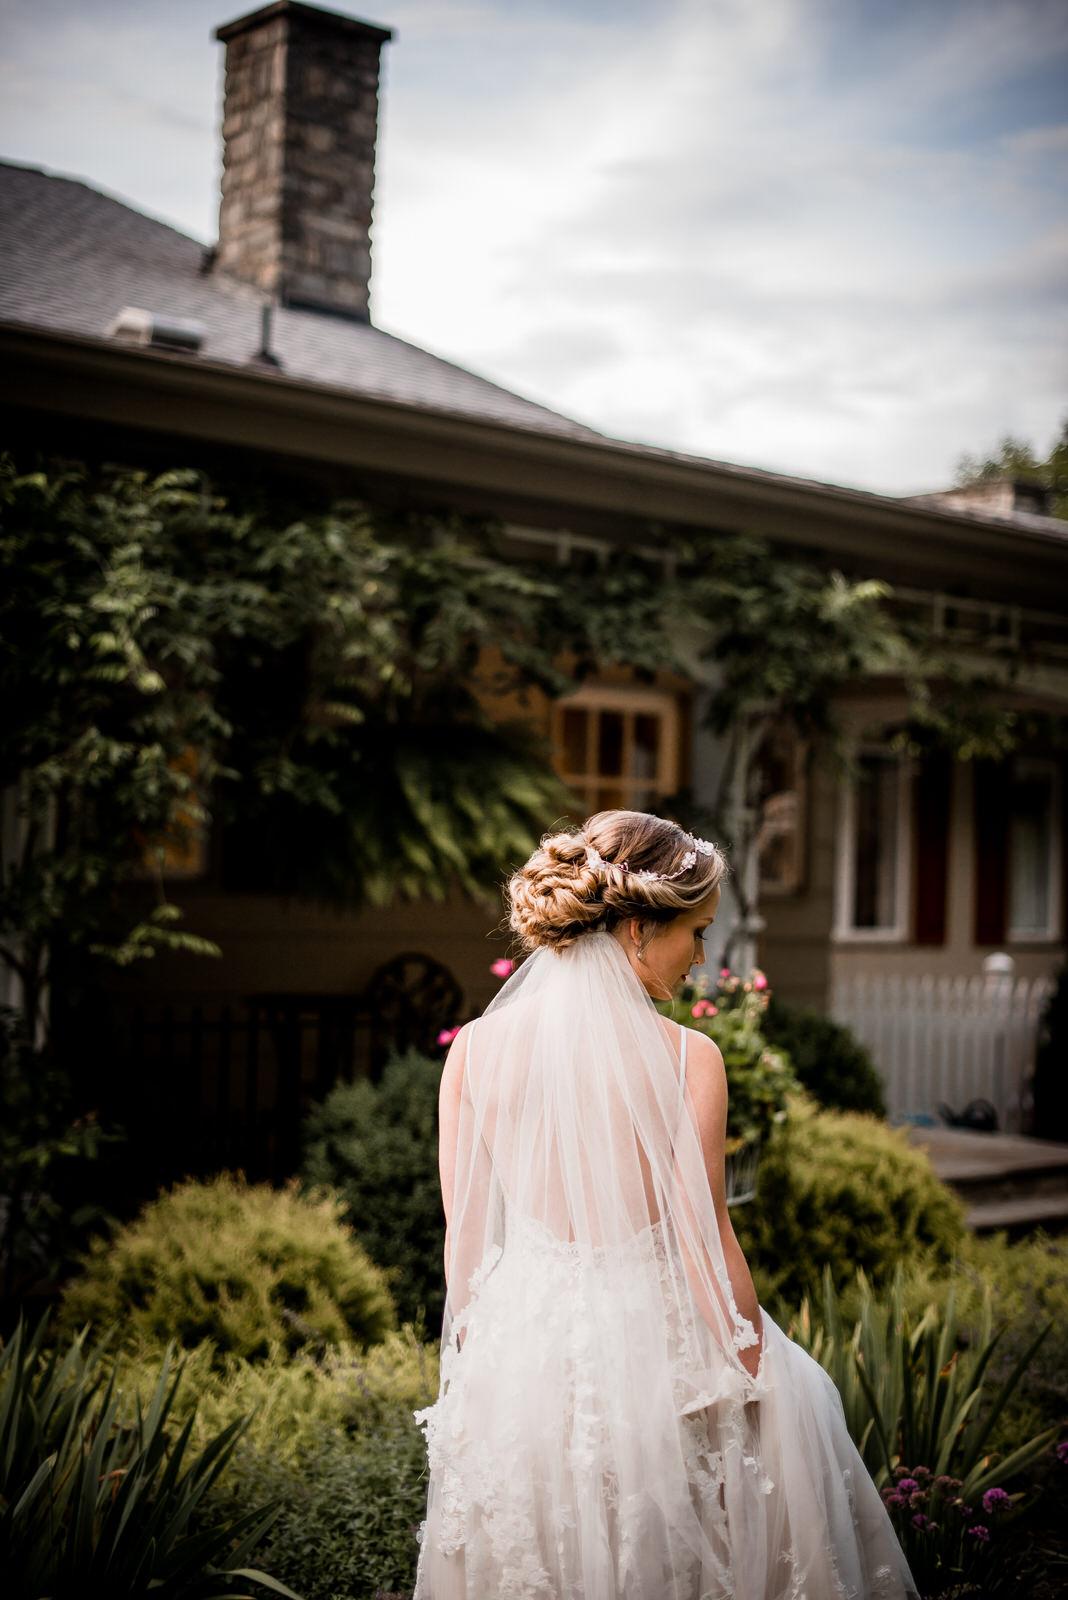 Inn-At-Tranquility-Farm-Bridal-Session-43.jpg